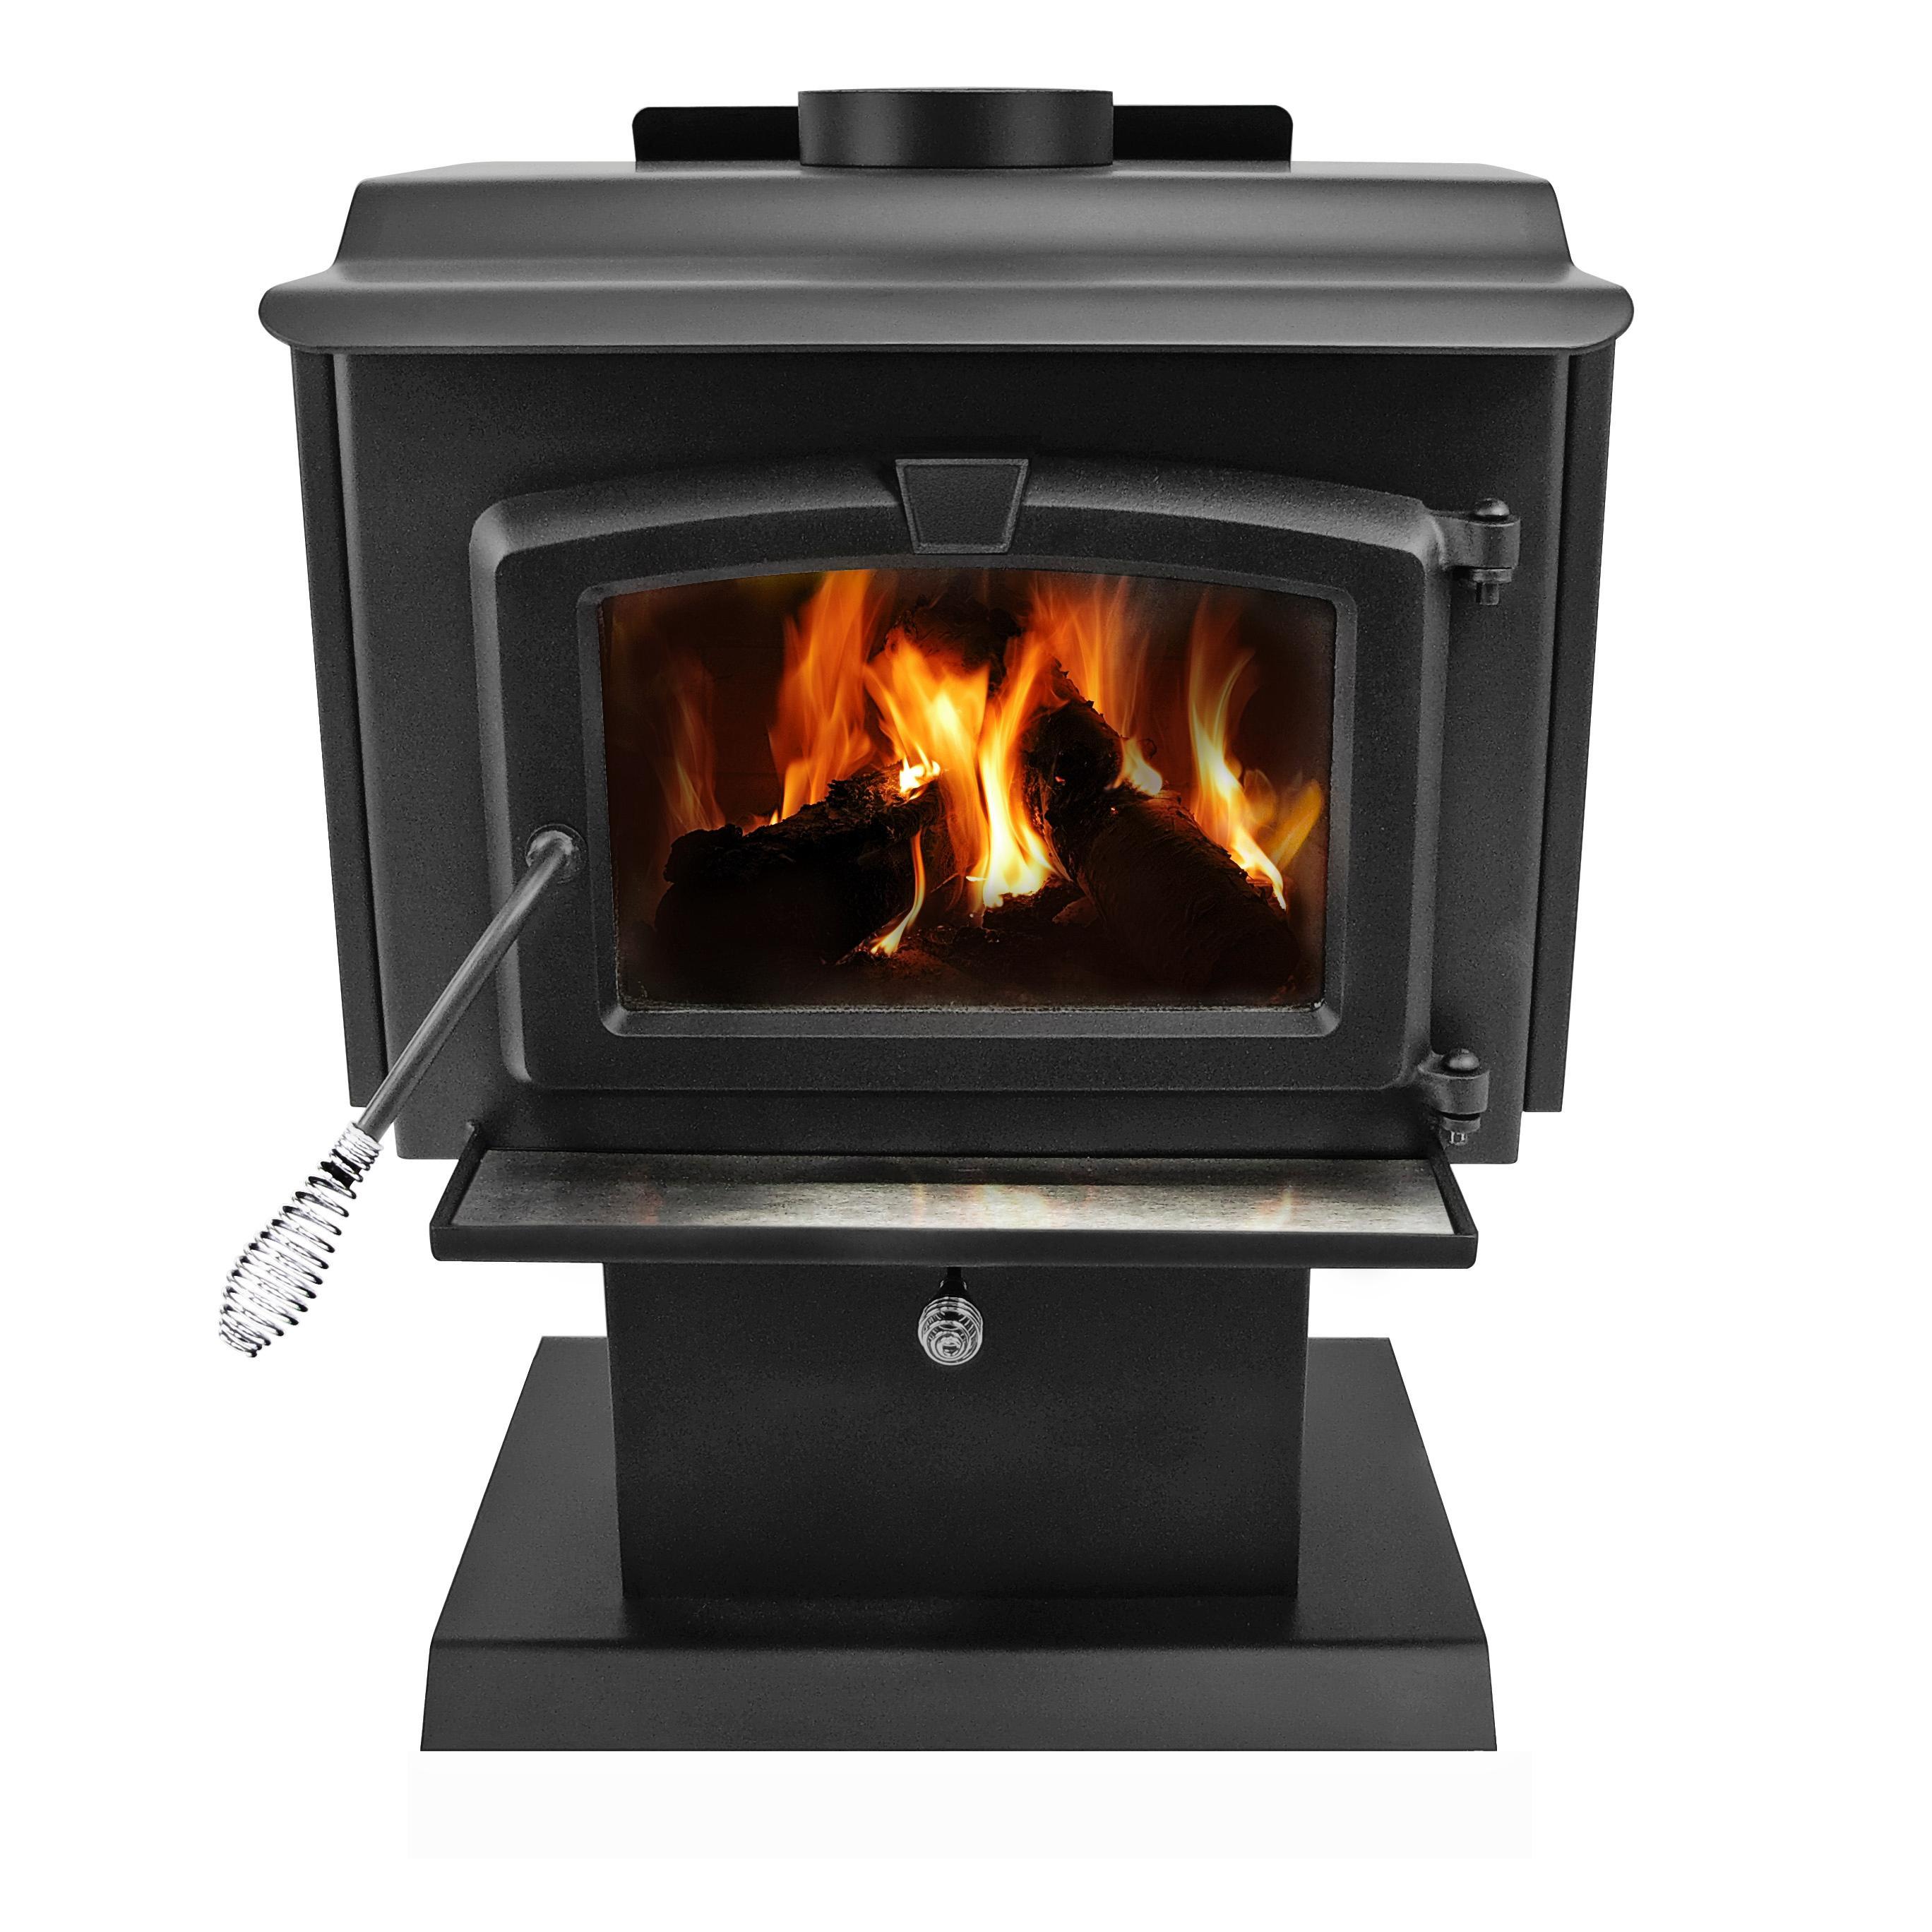 Hearth And Cabinets More: Amazon.com: Pleasant Hearth 1,200 Square Feet Wood Burning